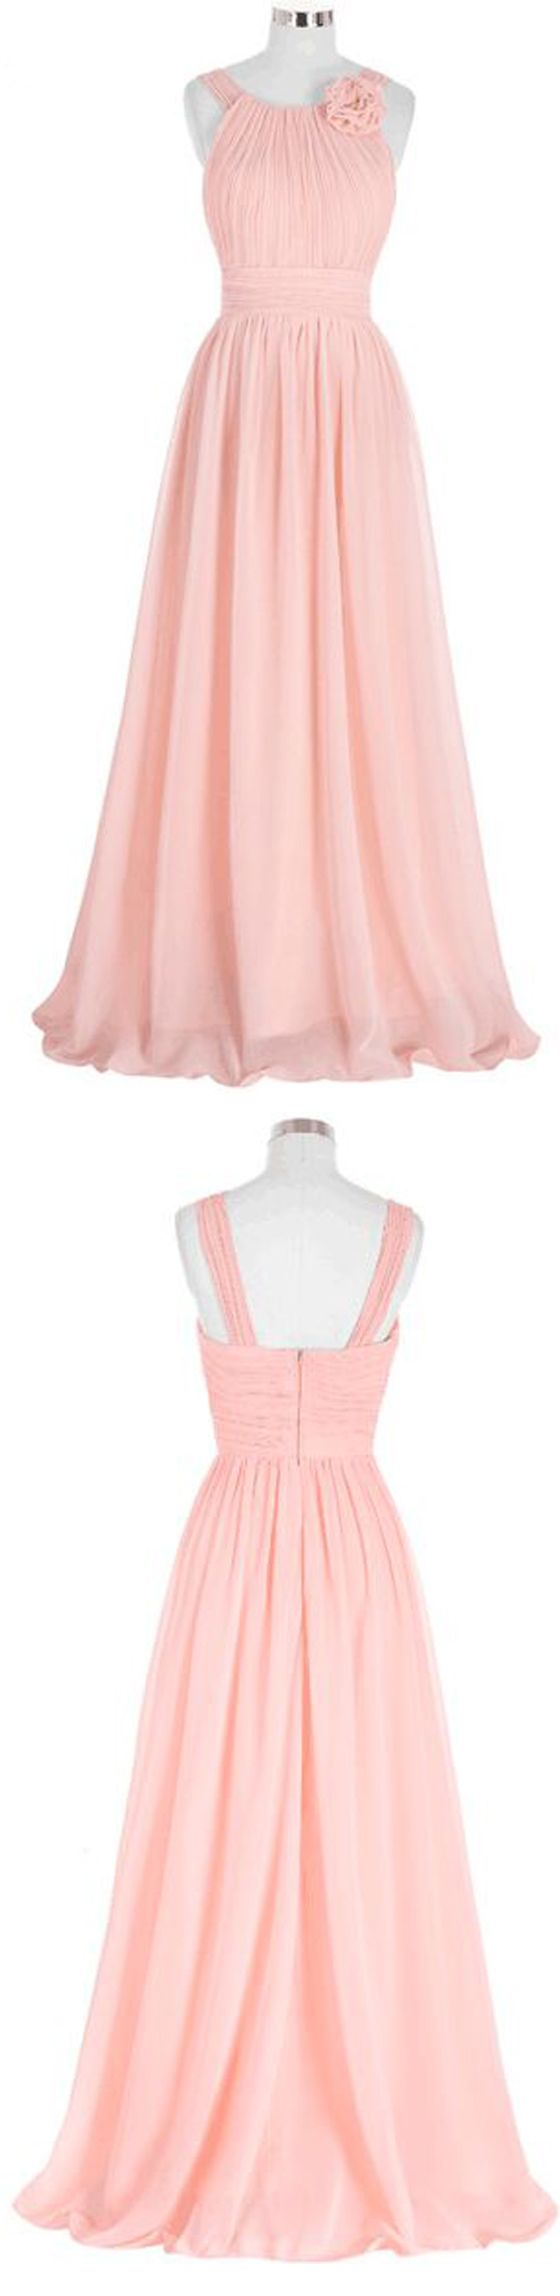 Elegant Pink Bridesmaid Dress,Long Chiffon Beach Bridesmaid Dresses,2017 Wedding Formal Dress,220060